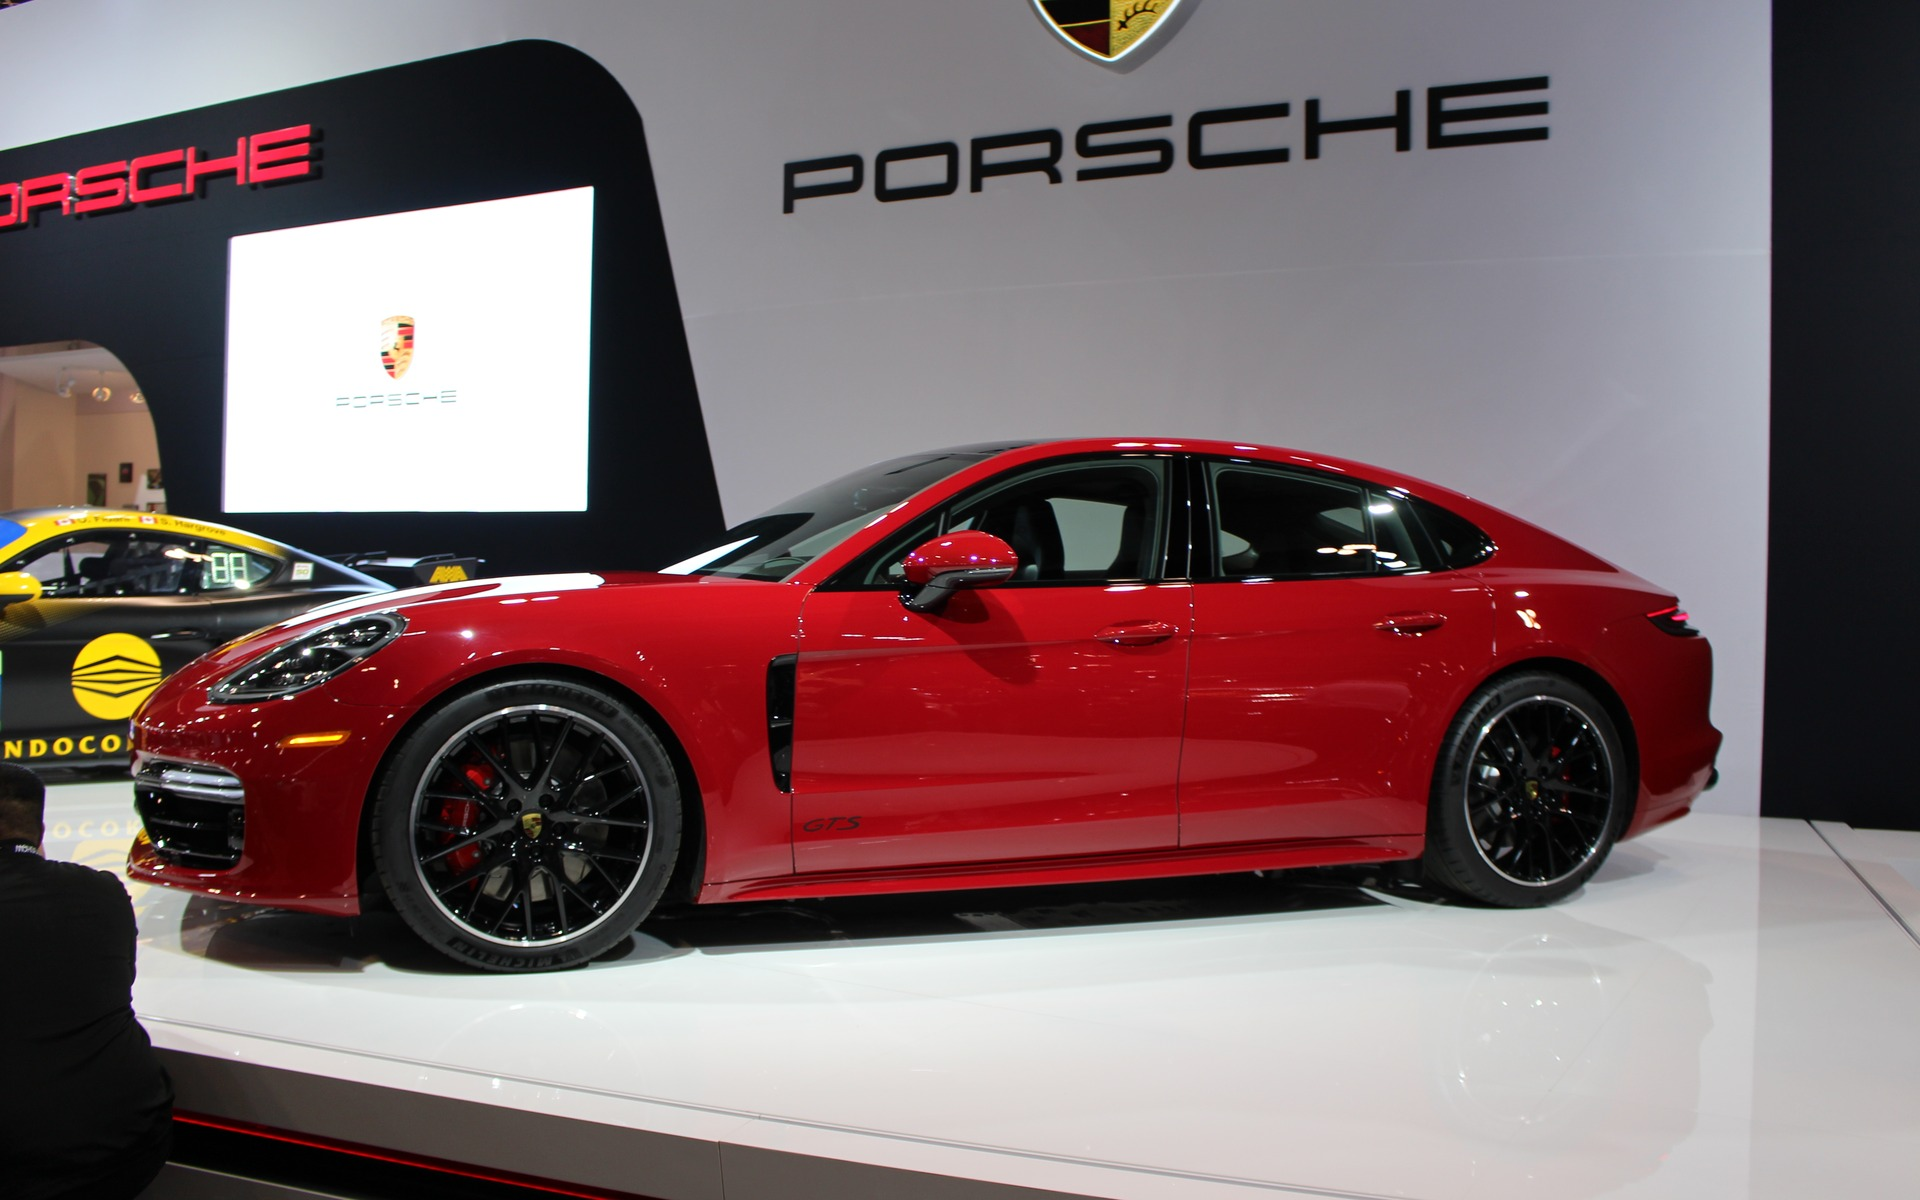 Porsche Presents Panamera Gts And 718 Cayman Gt4 Clubsport